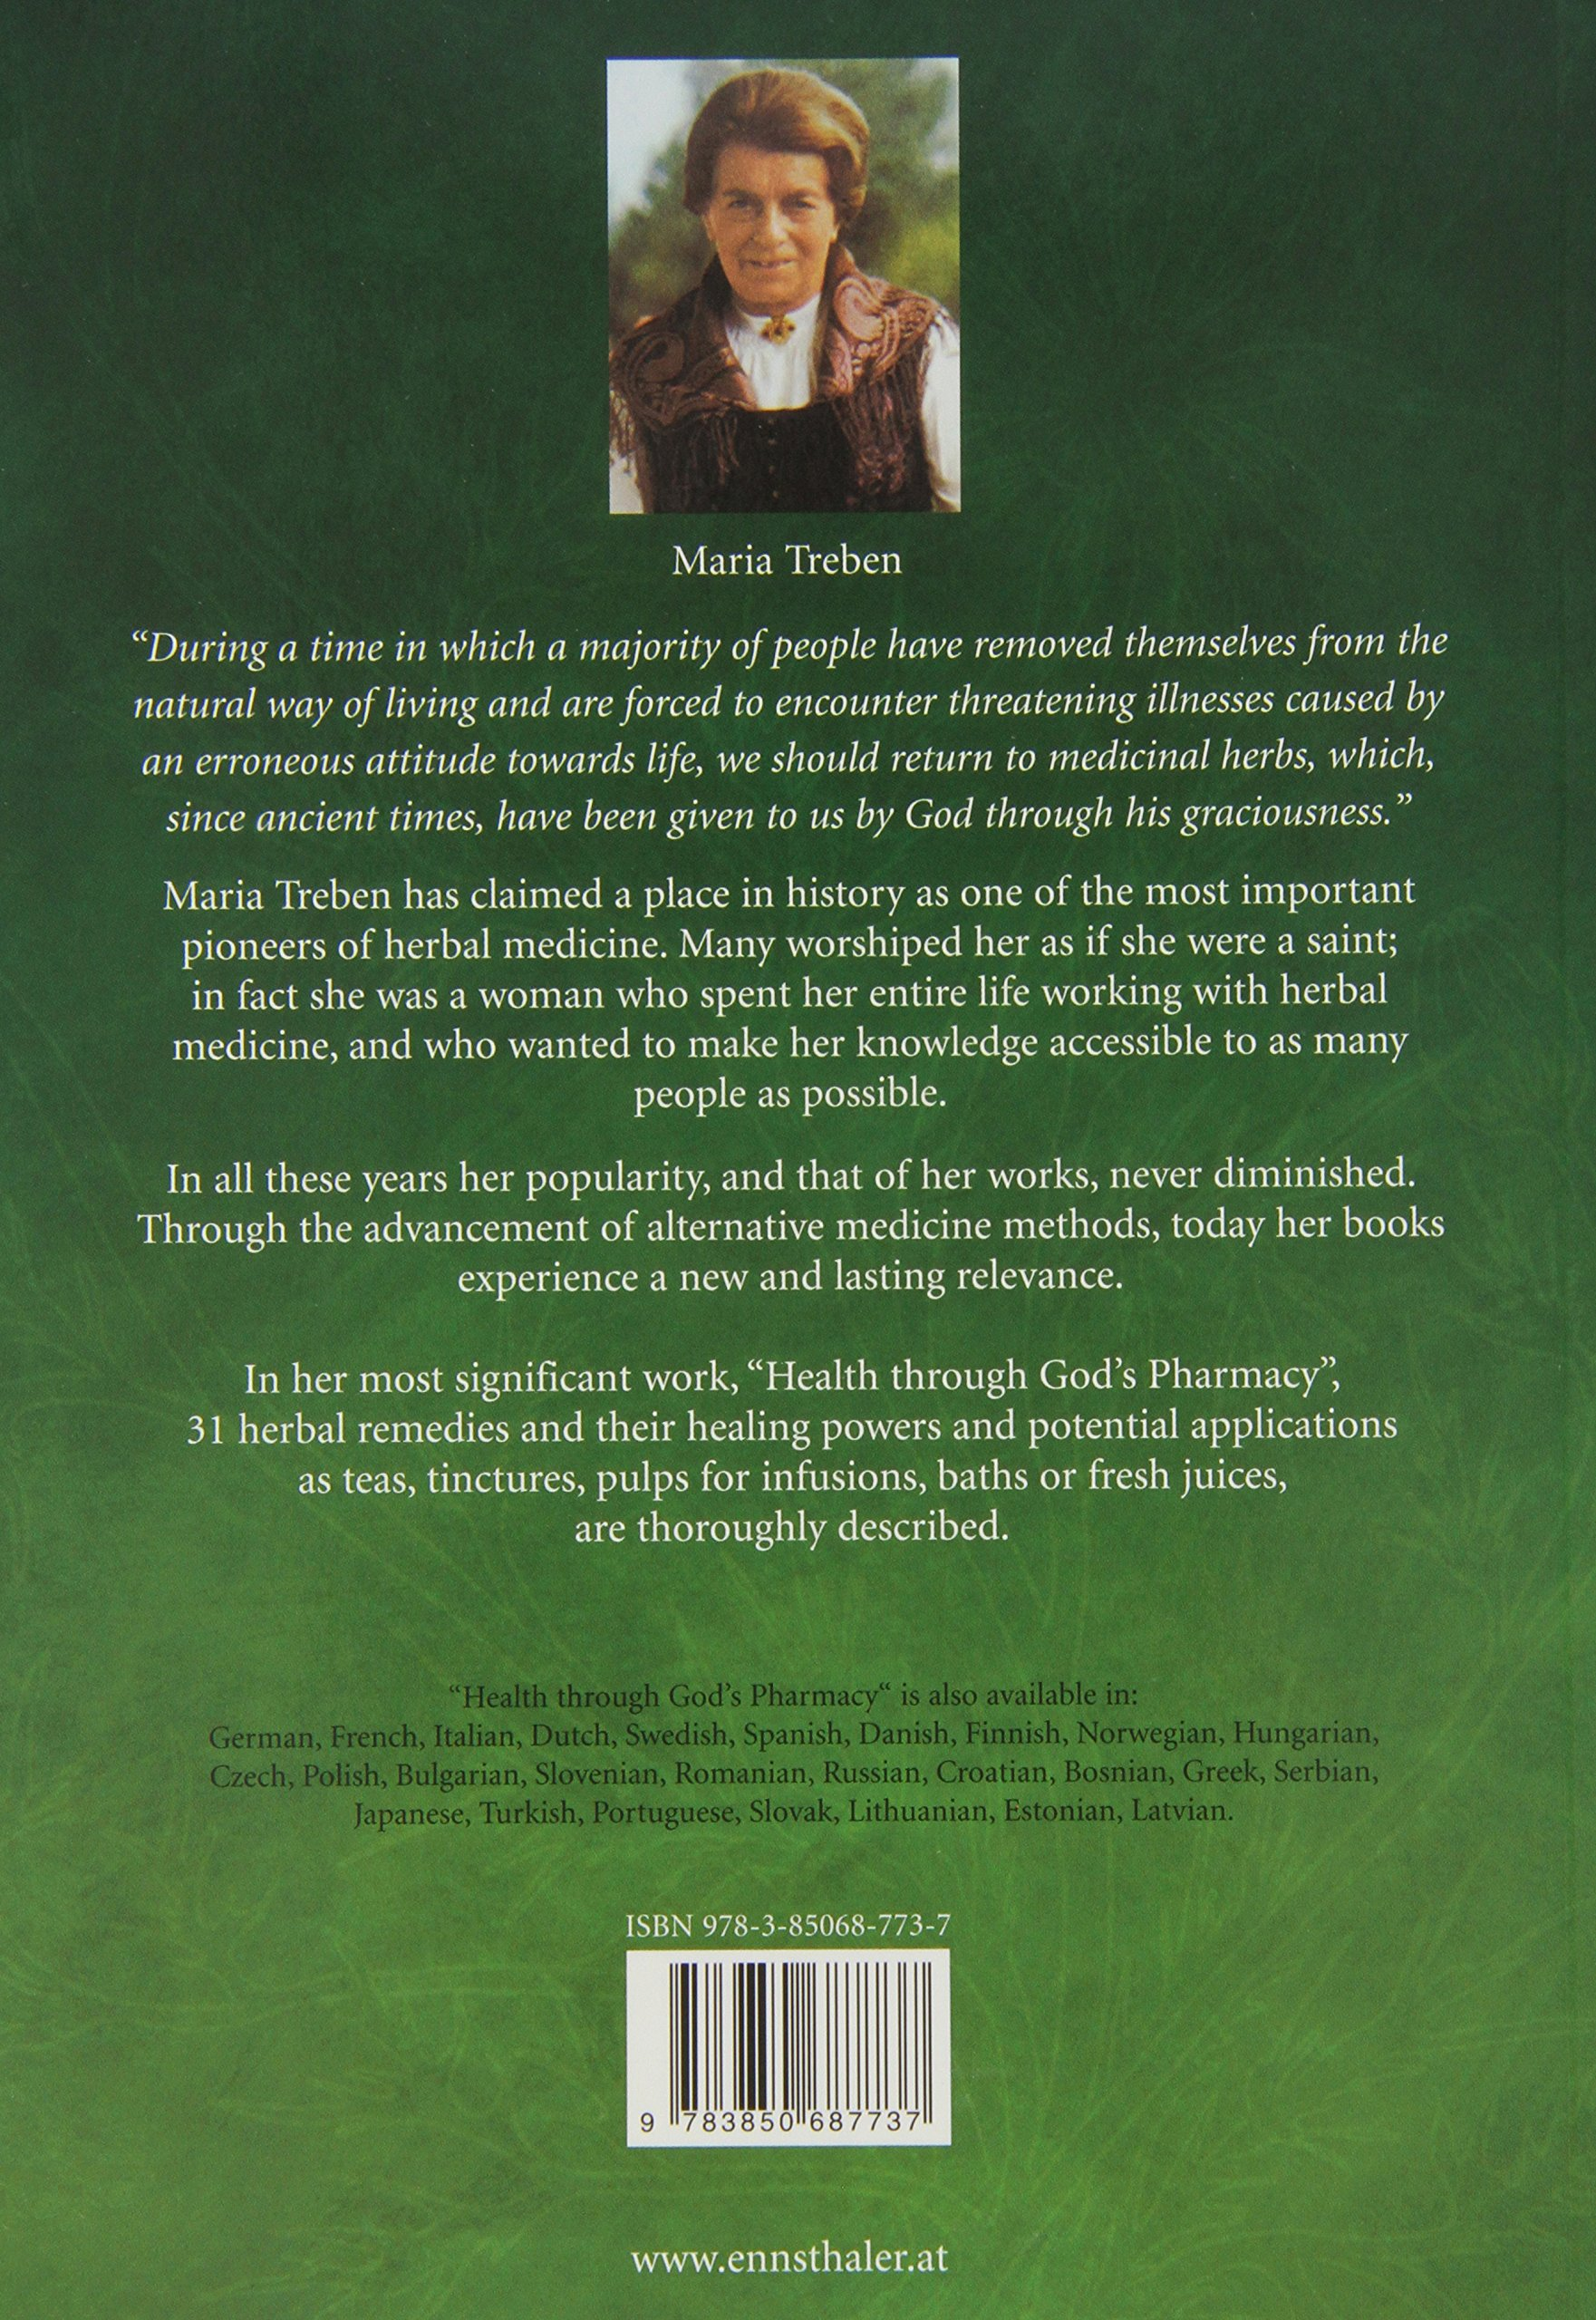 maria treben health through gods pharmacy